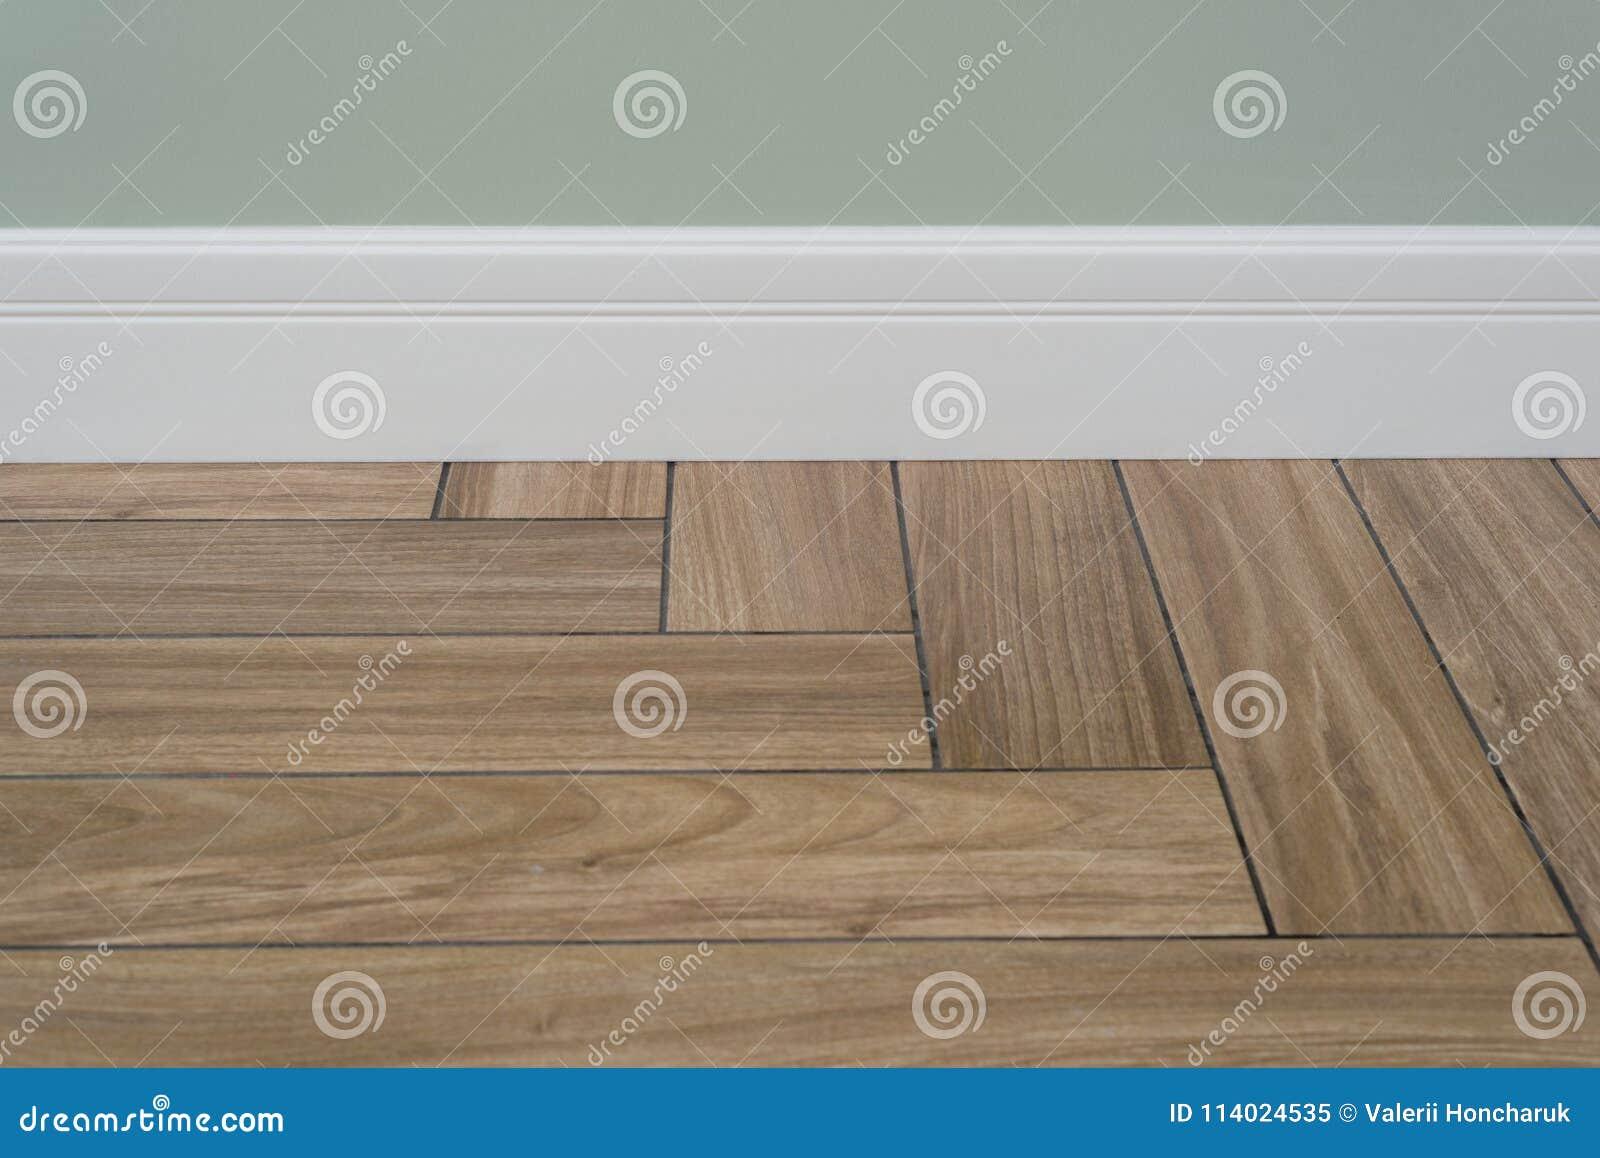 Binnenlands concept Lichte steenmuur, witte plint en tegels die hardhoutbevloering imiteren